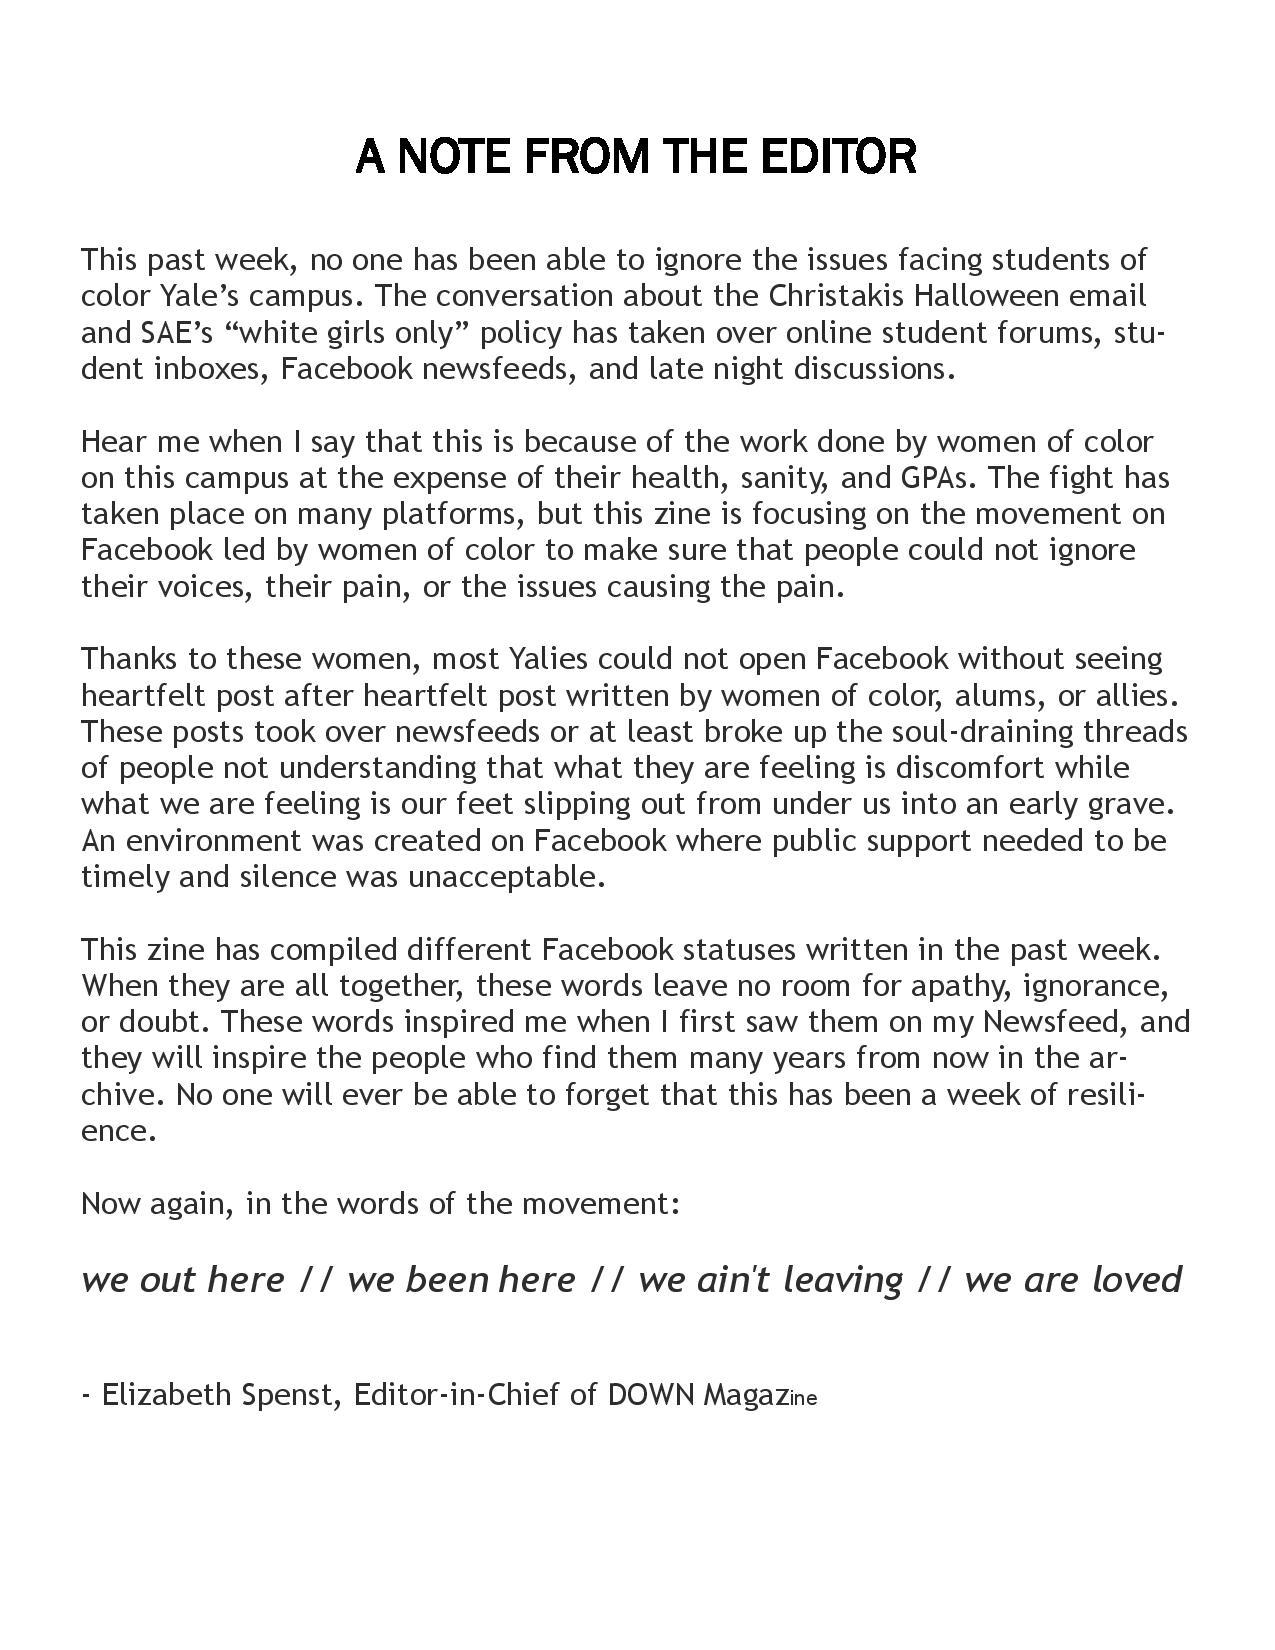 FinalDownZine (1)-page-002